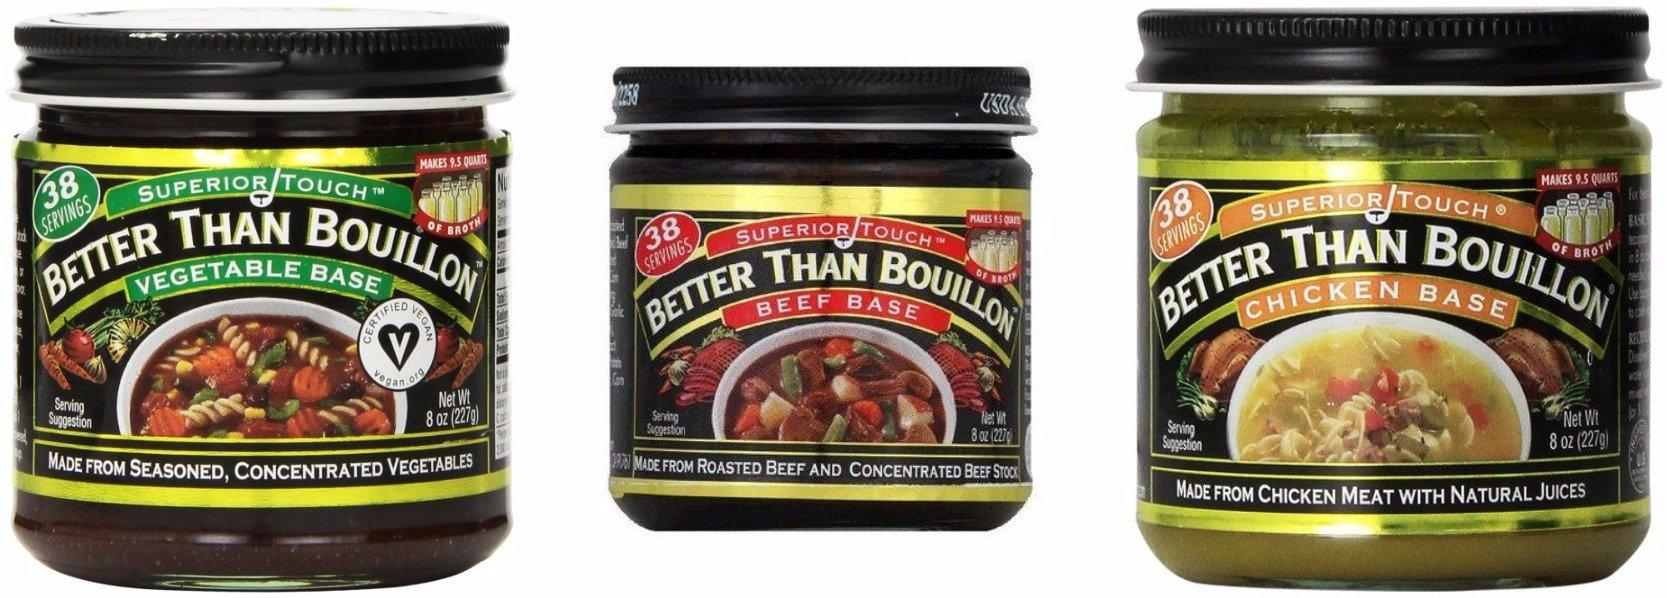 Bundle of 3: Better Than Bouillon Seasoned Vegetable Base, Roasted Beef Base and Roasted Chicken Base 38 Servings Each Flavor